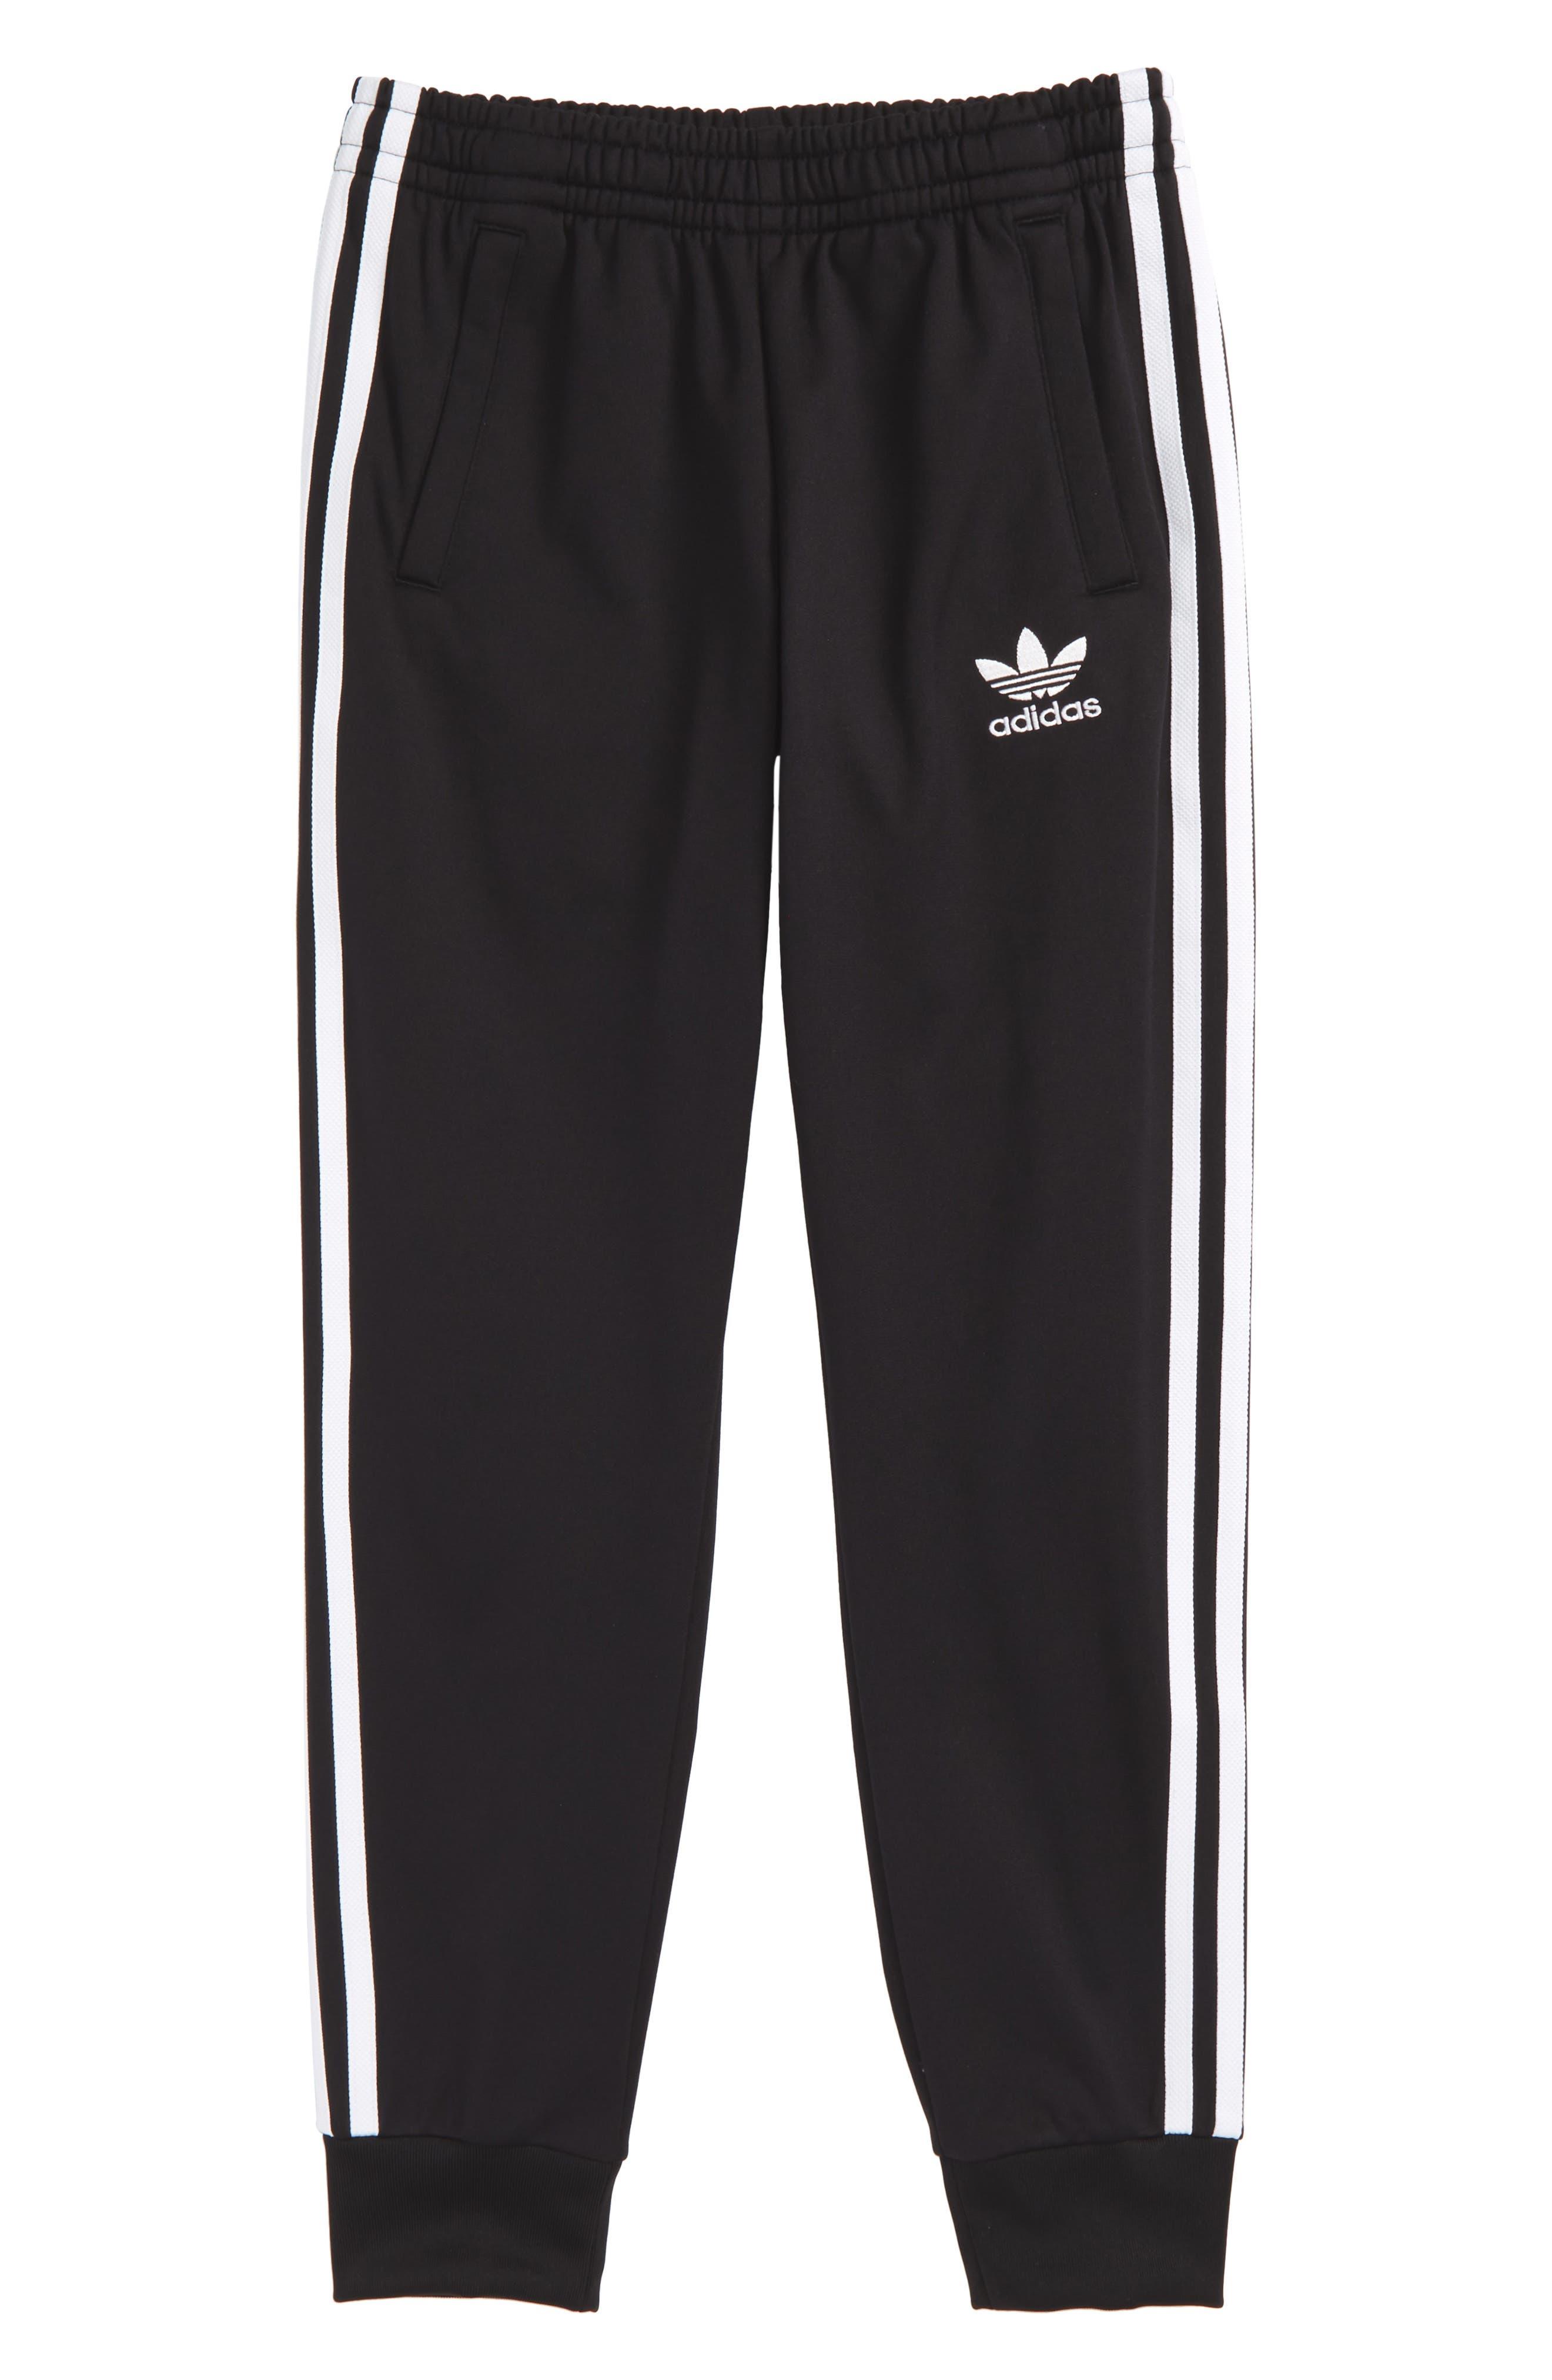 Main Image - adidas Originals Superstar Track Pants (Little Boys & Big Boys)